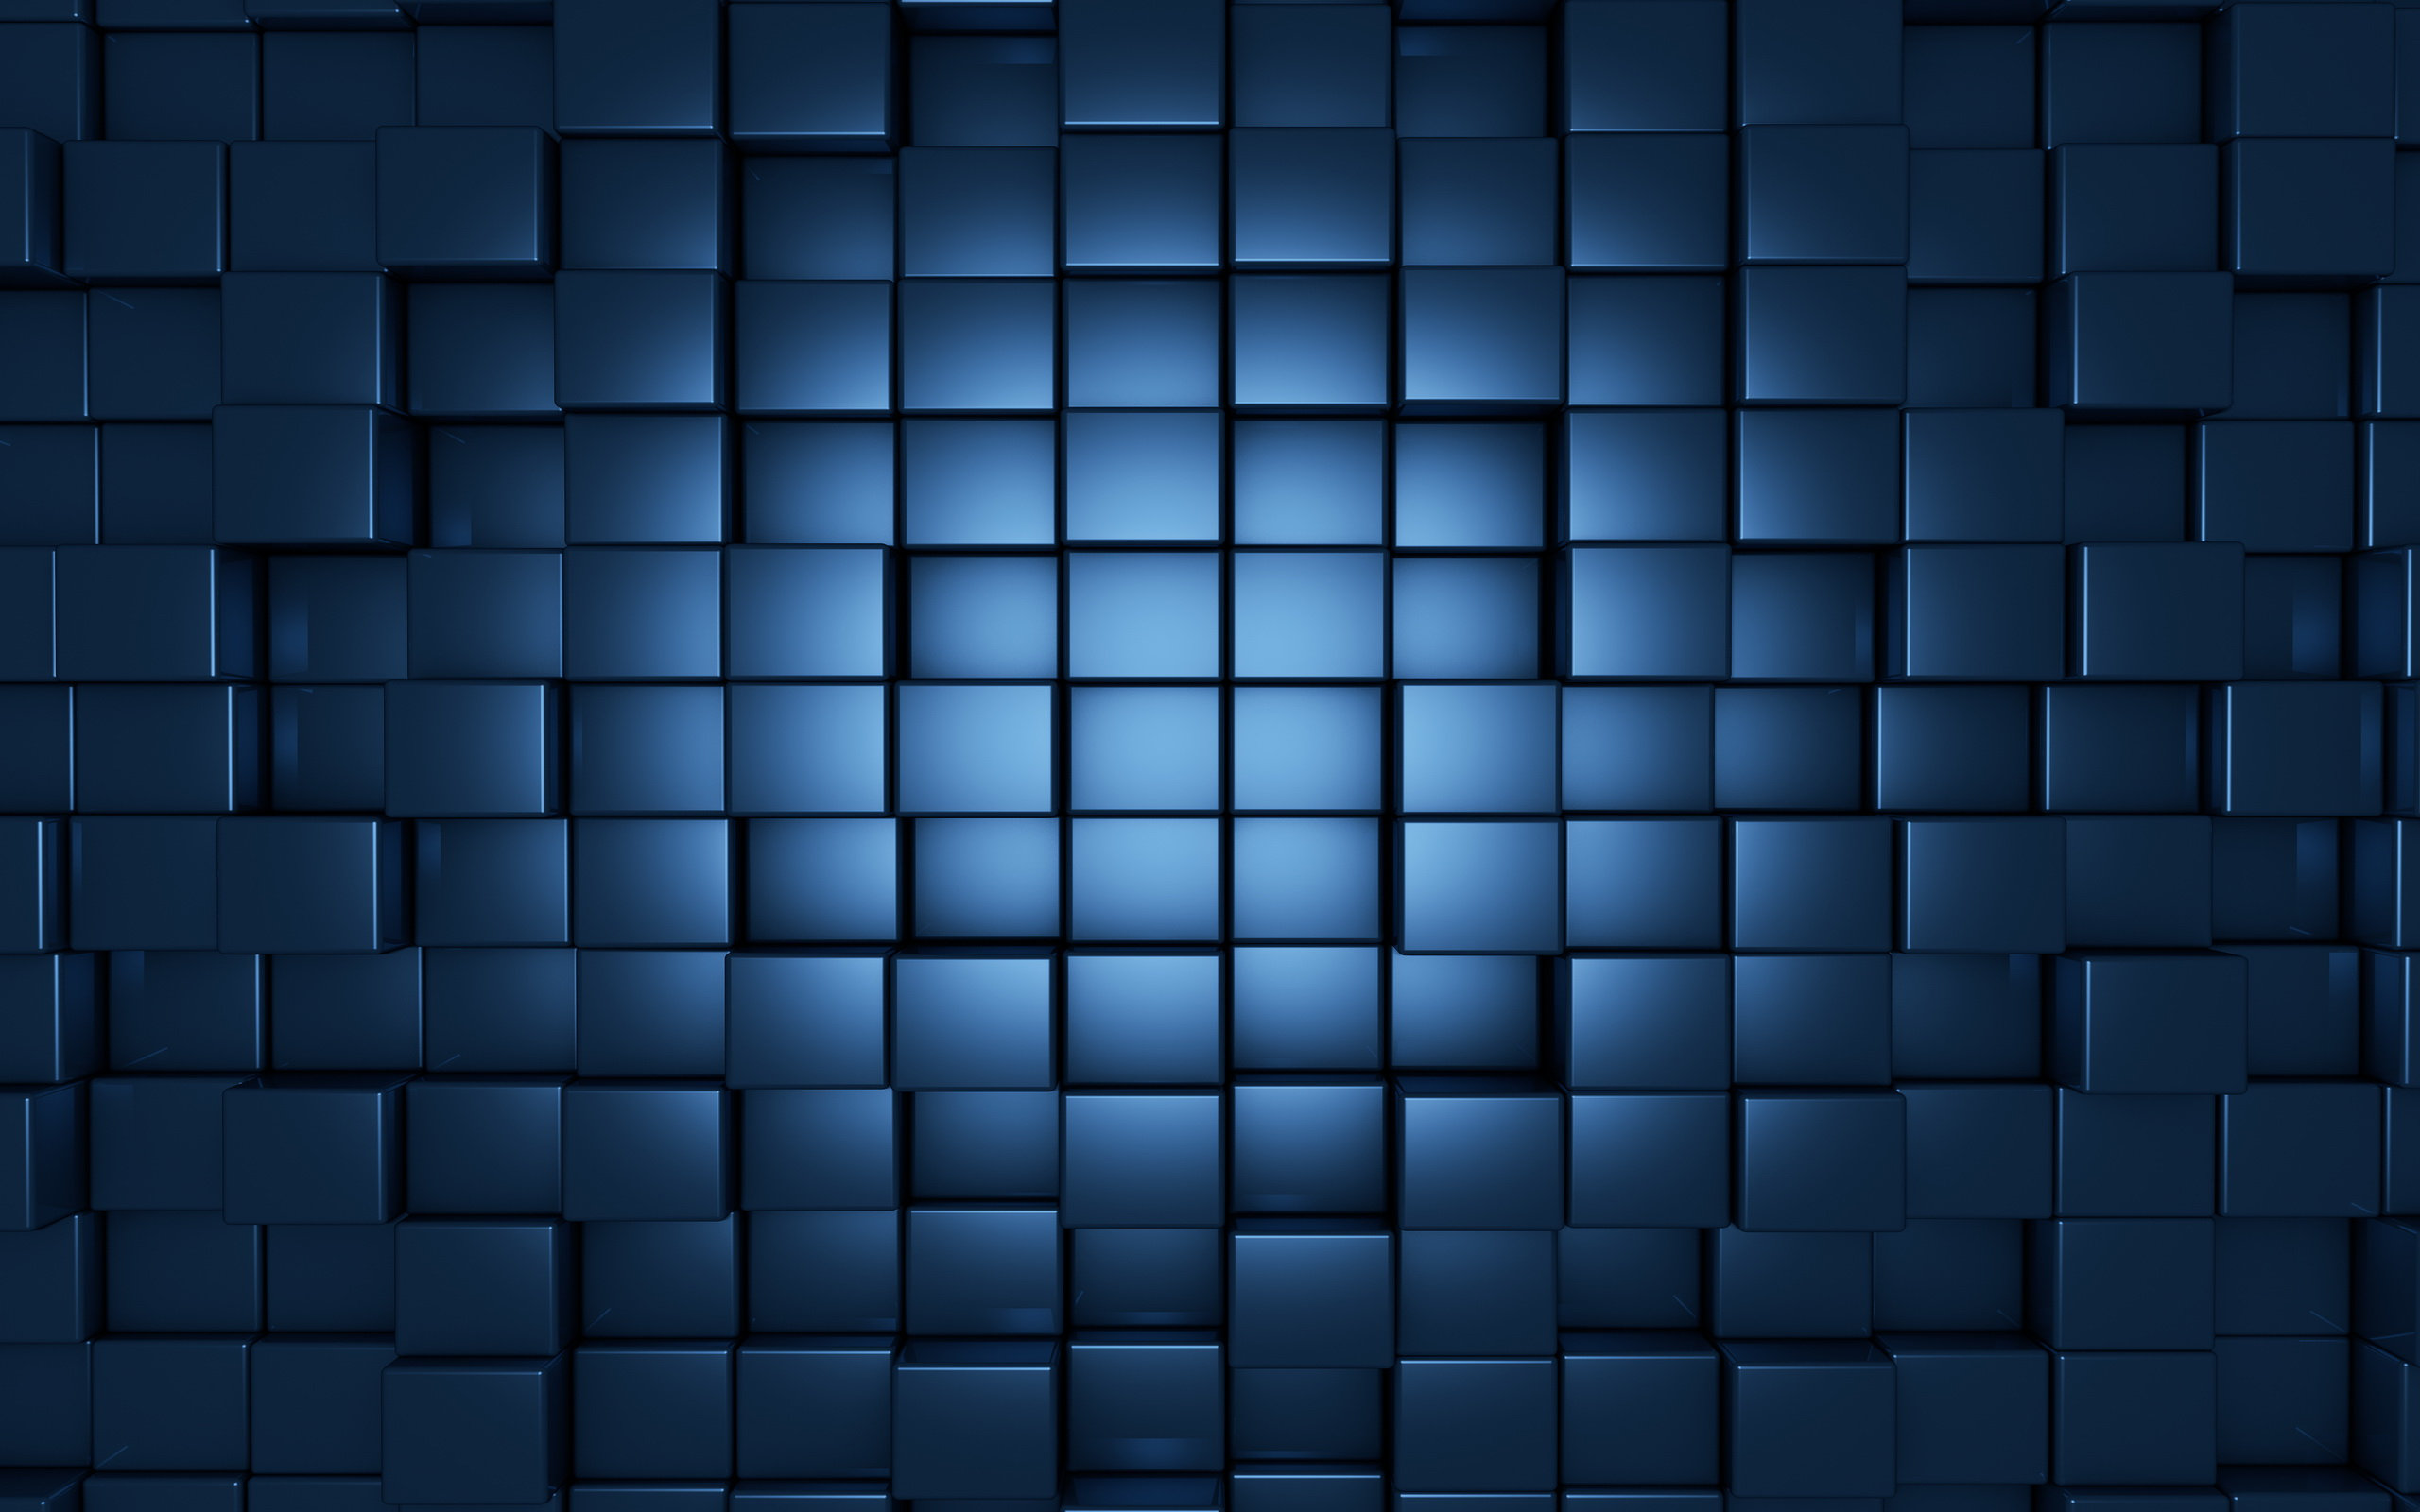 Cube Computer Wallpapers Desktop Backgrounds 2560x1600 ID437932 2560x1600